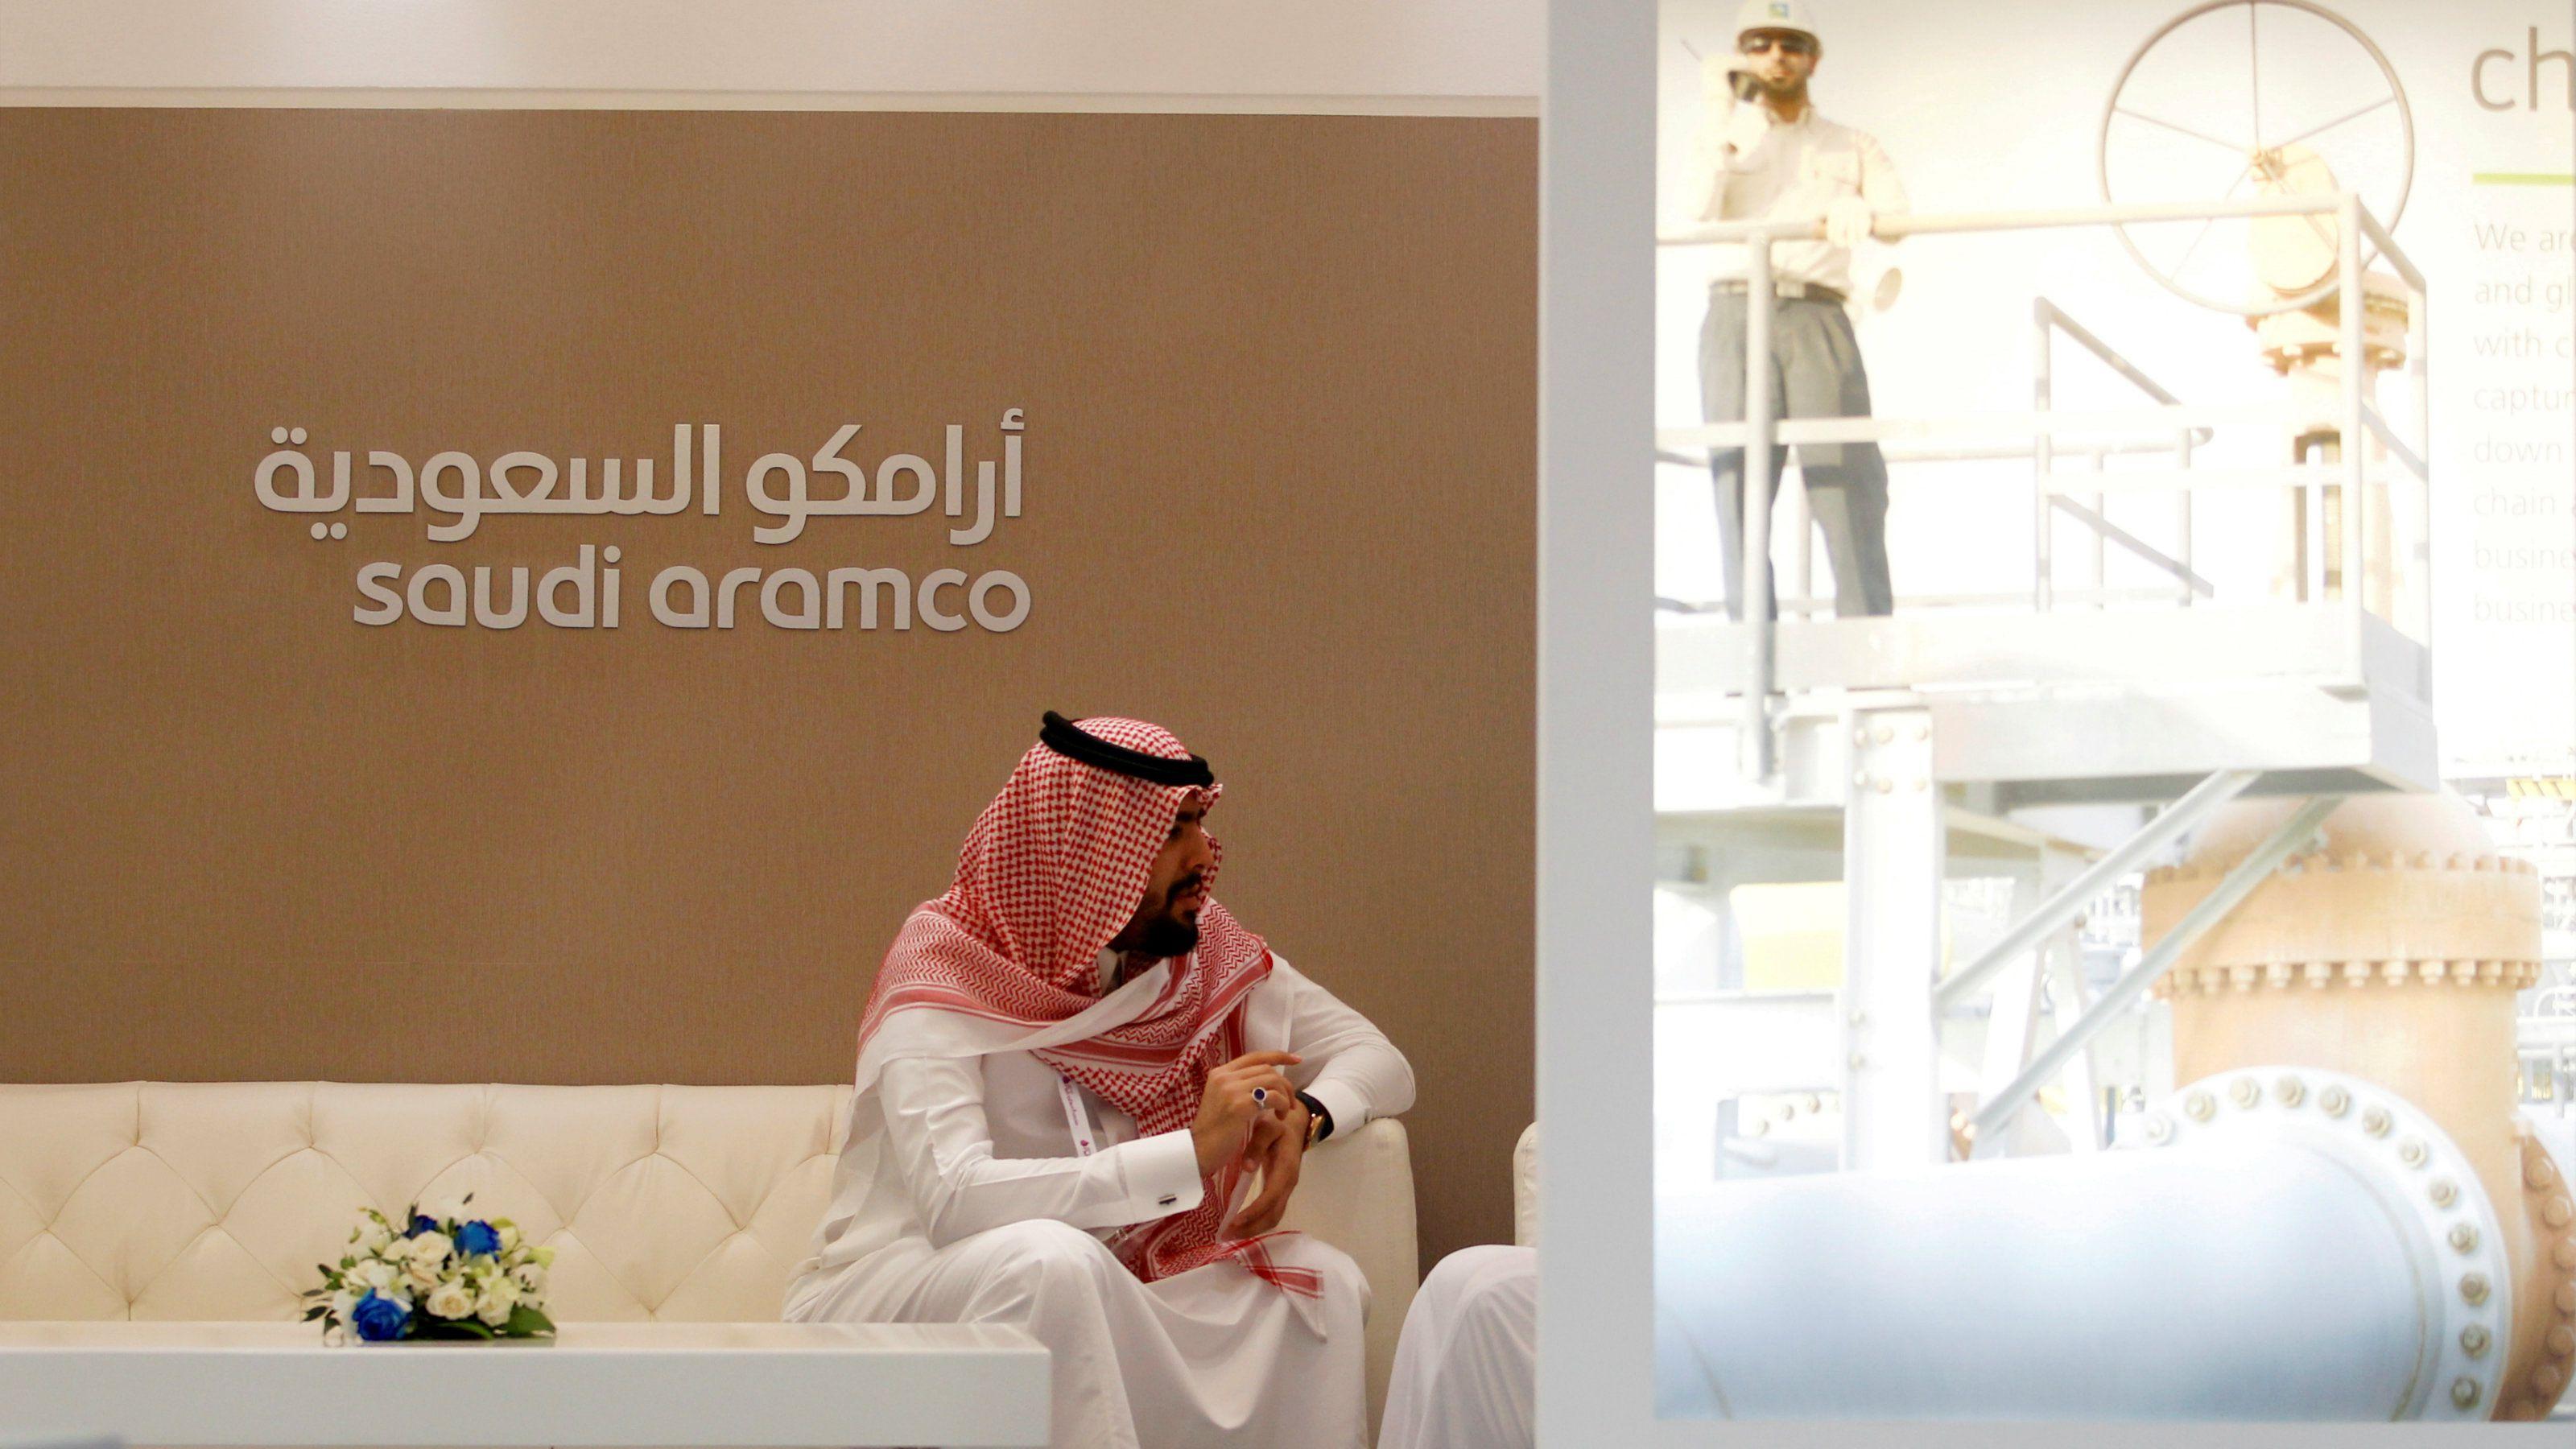 Saudi Aramco office